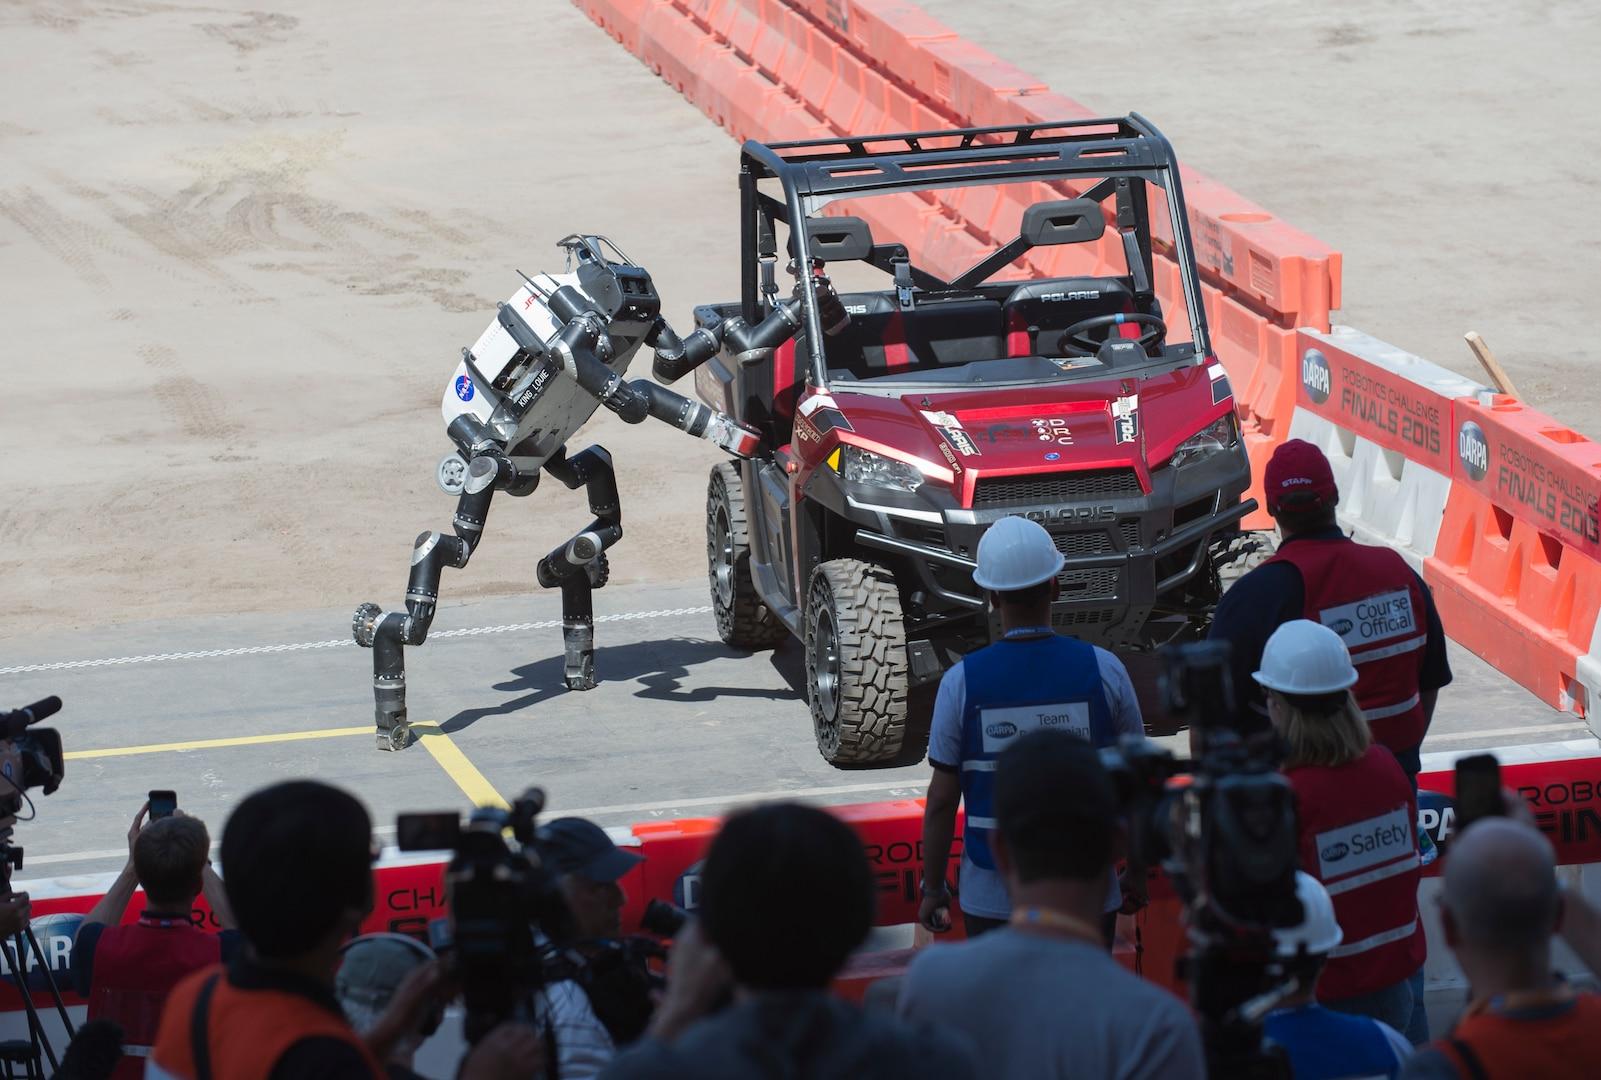 RoboSimian from Jet Propulsion Laboratory exits vehicle during DARPA Robotics Challenge, June 5, 2015, in Pomona, California (U.S. Navy/John F. Williams)